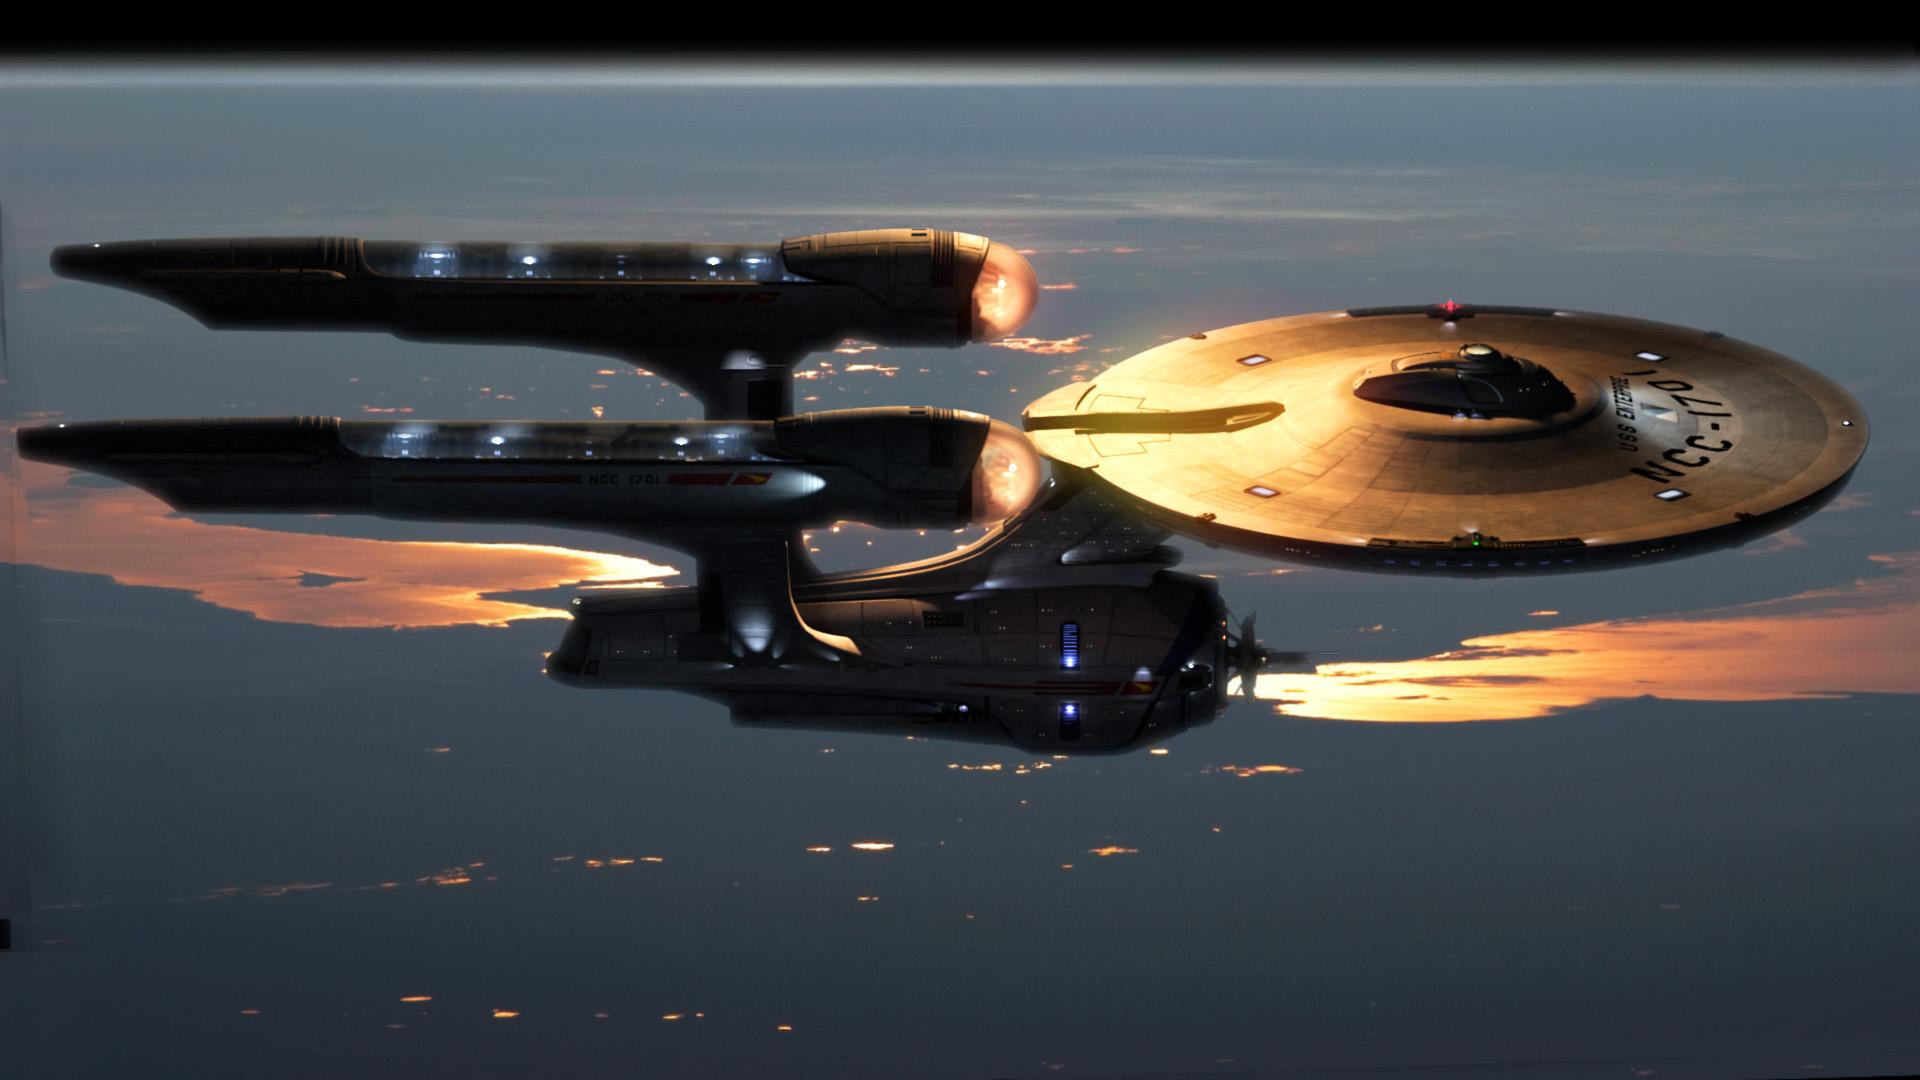 Star Trek Enterprise Wallpapers Once Upon a Geek 1920x1080